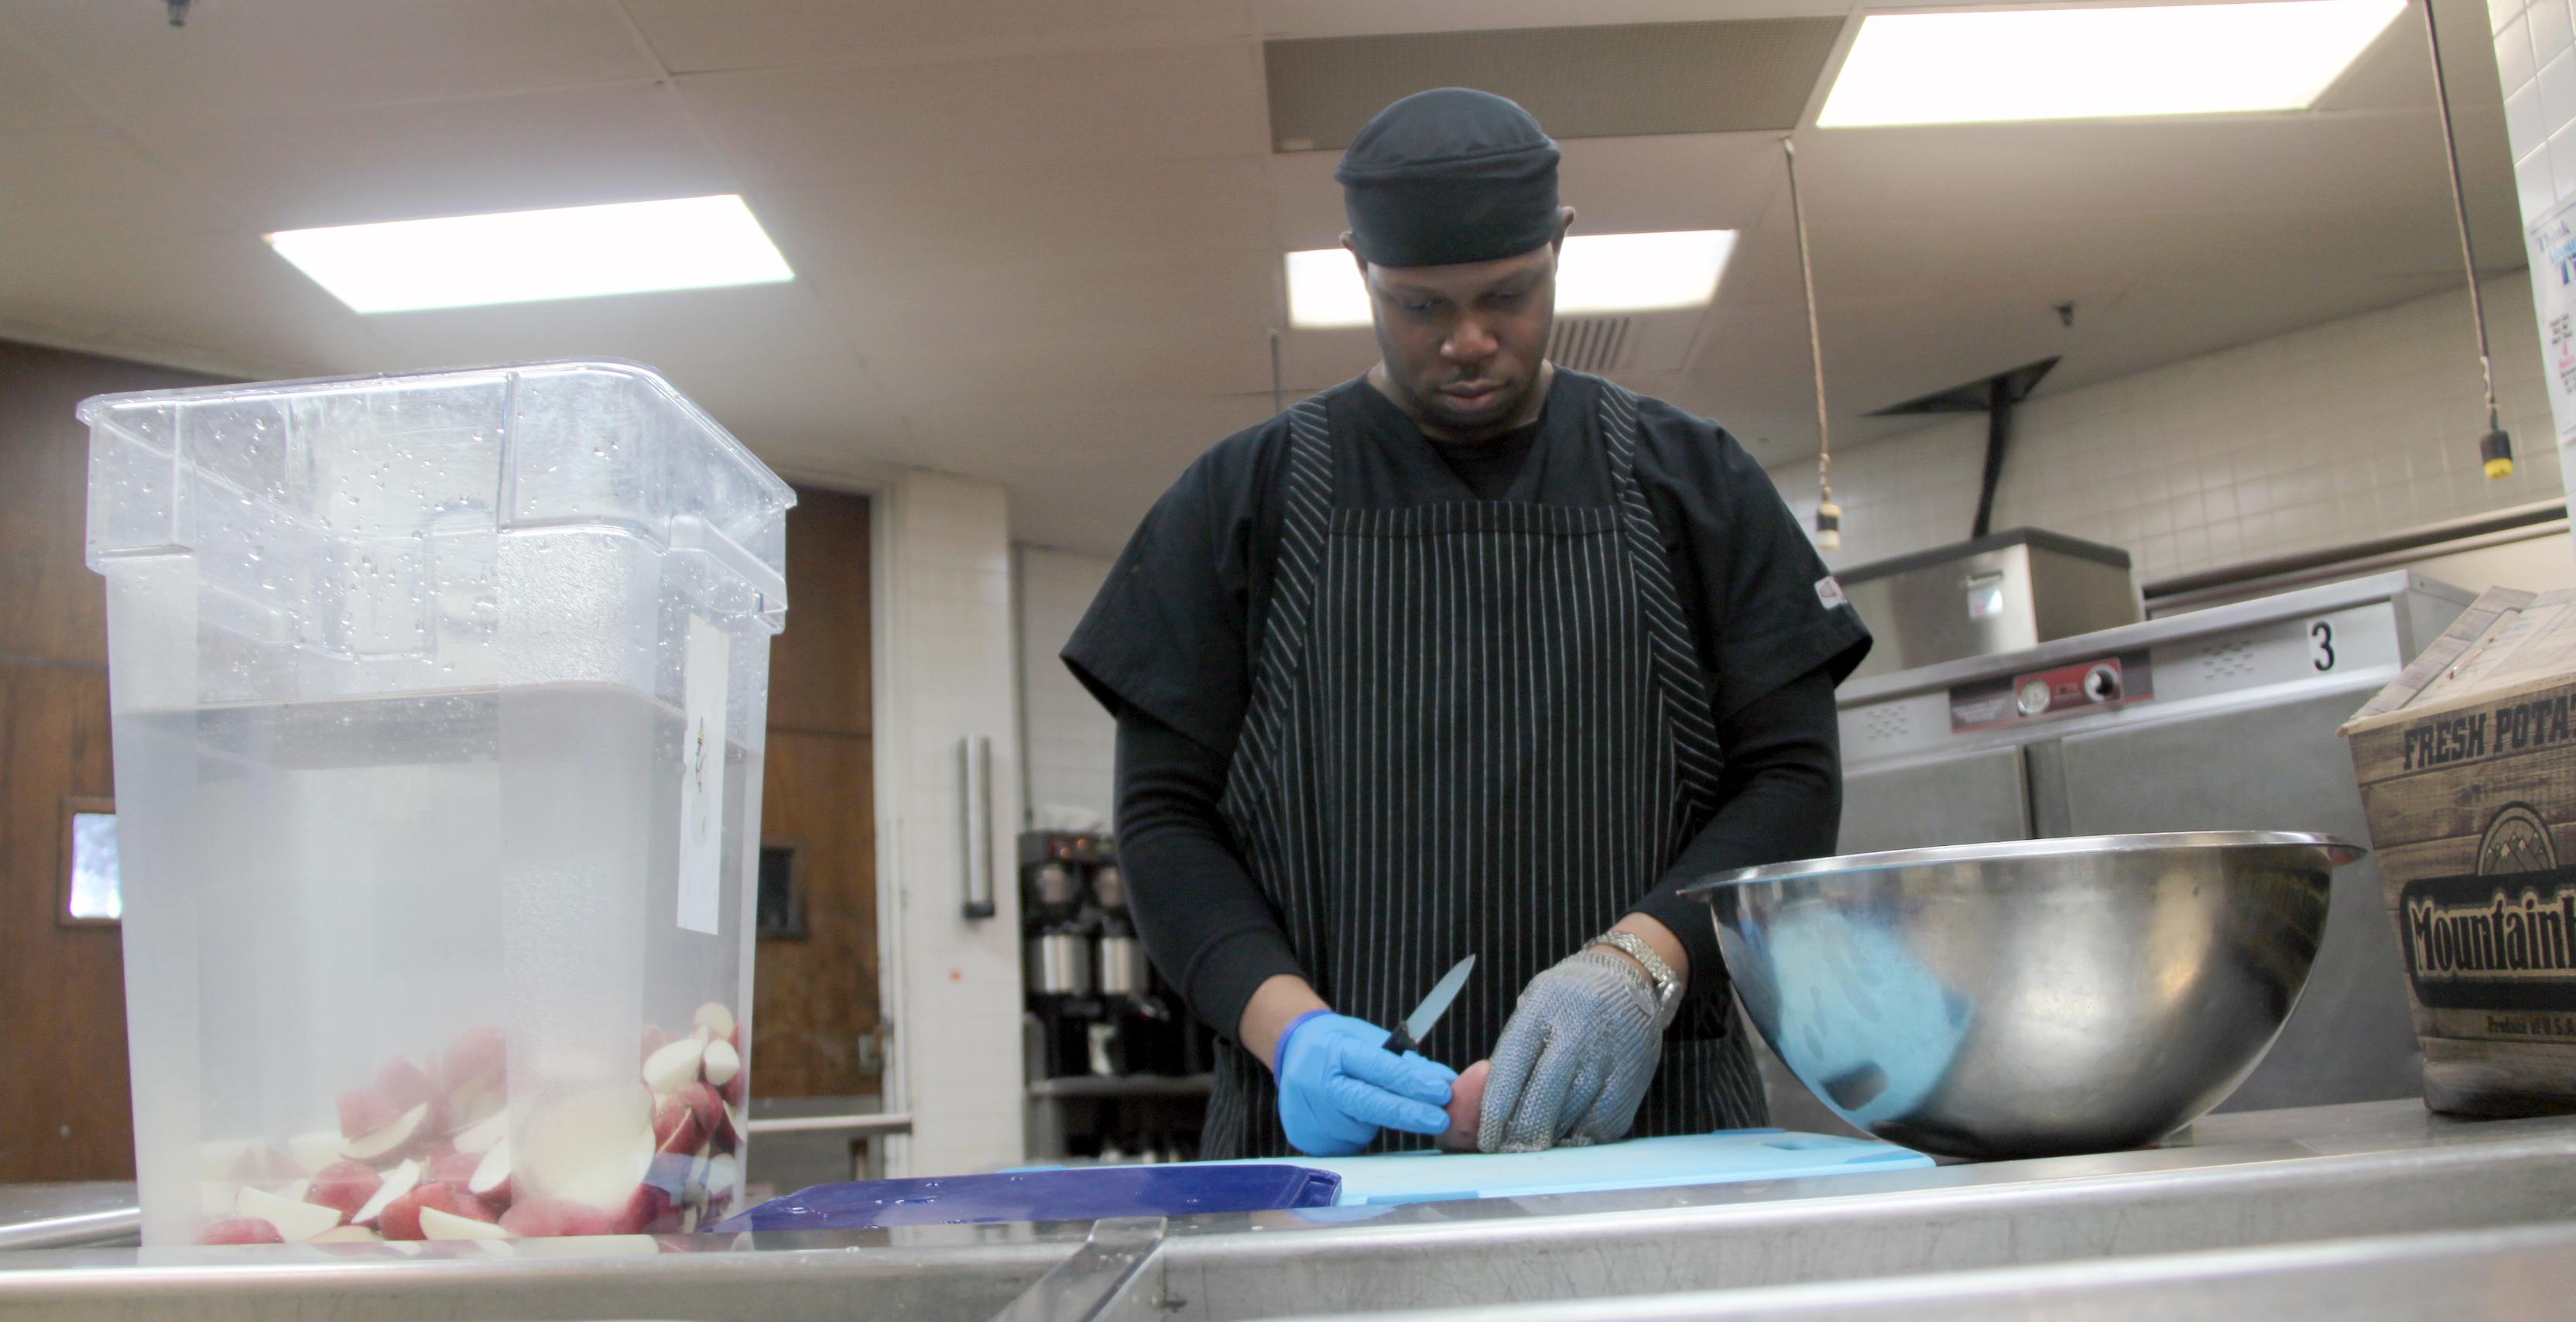 A trainee preps potatoes